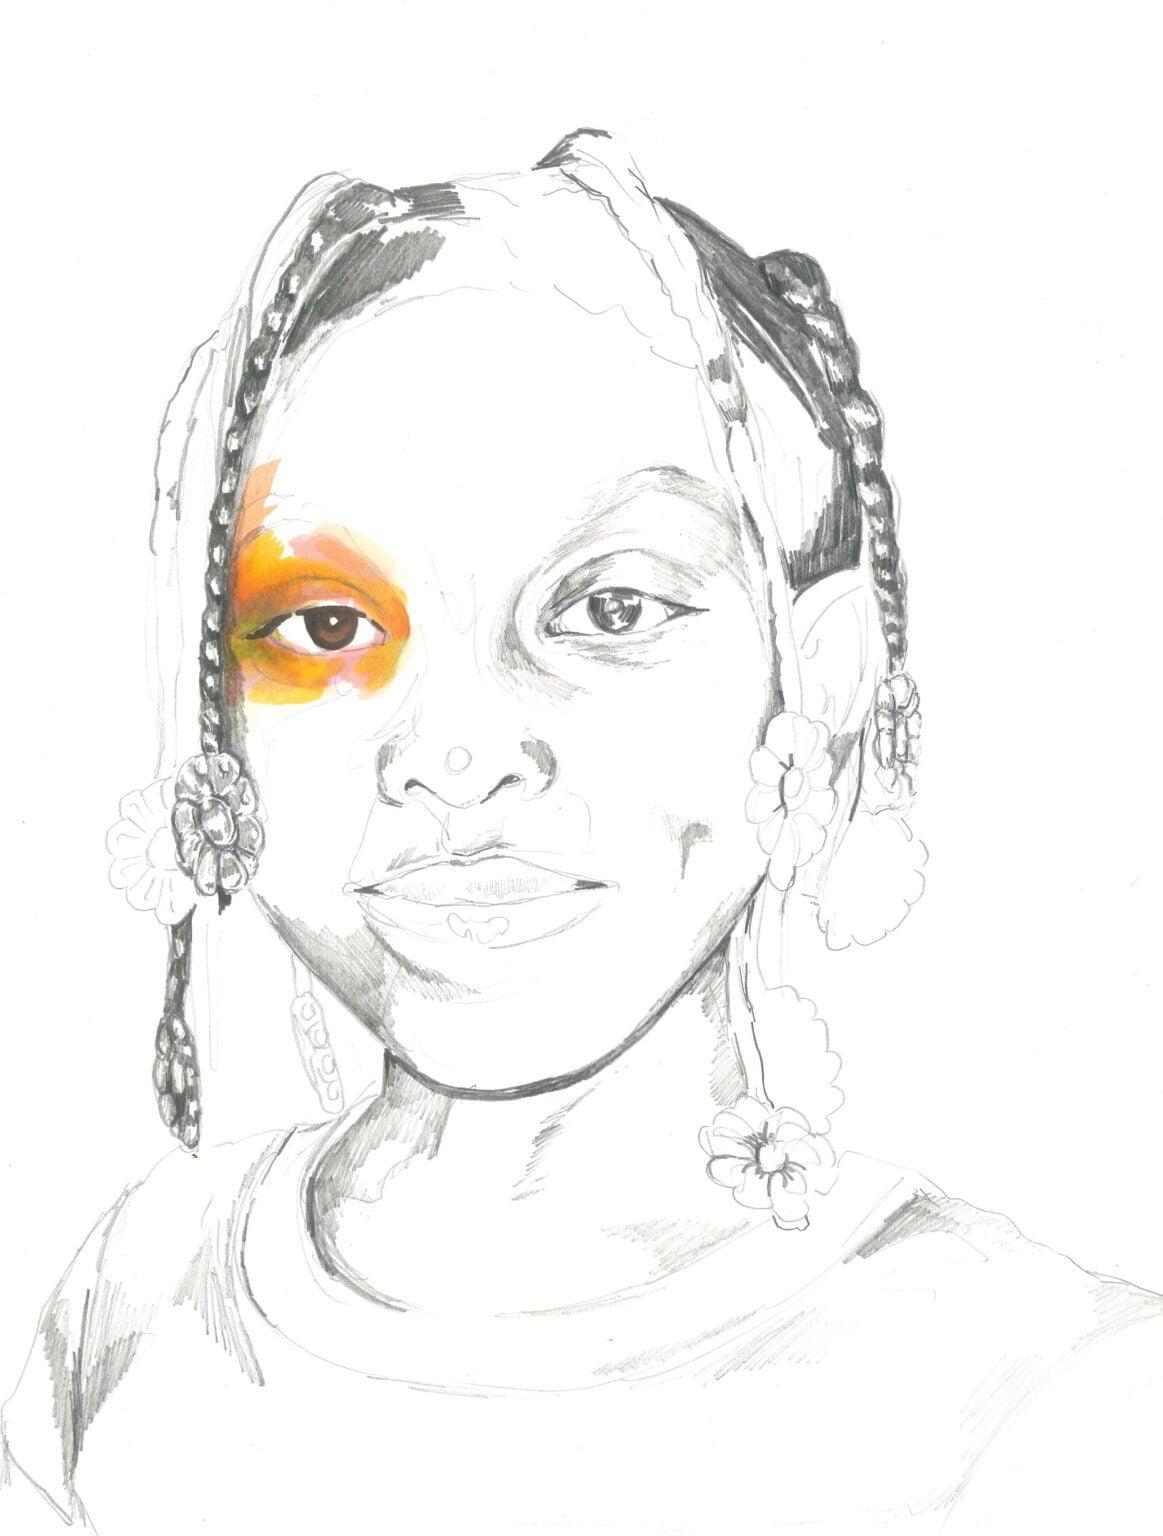 «Stolen»: ημιτελή πορτρέτα θυμάτων ρατσιστικής βίας